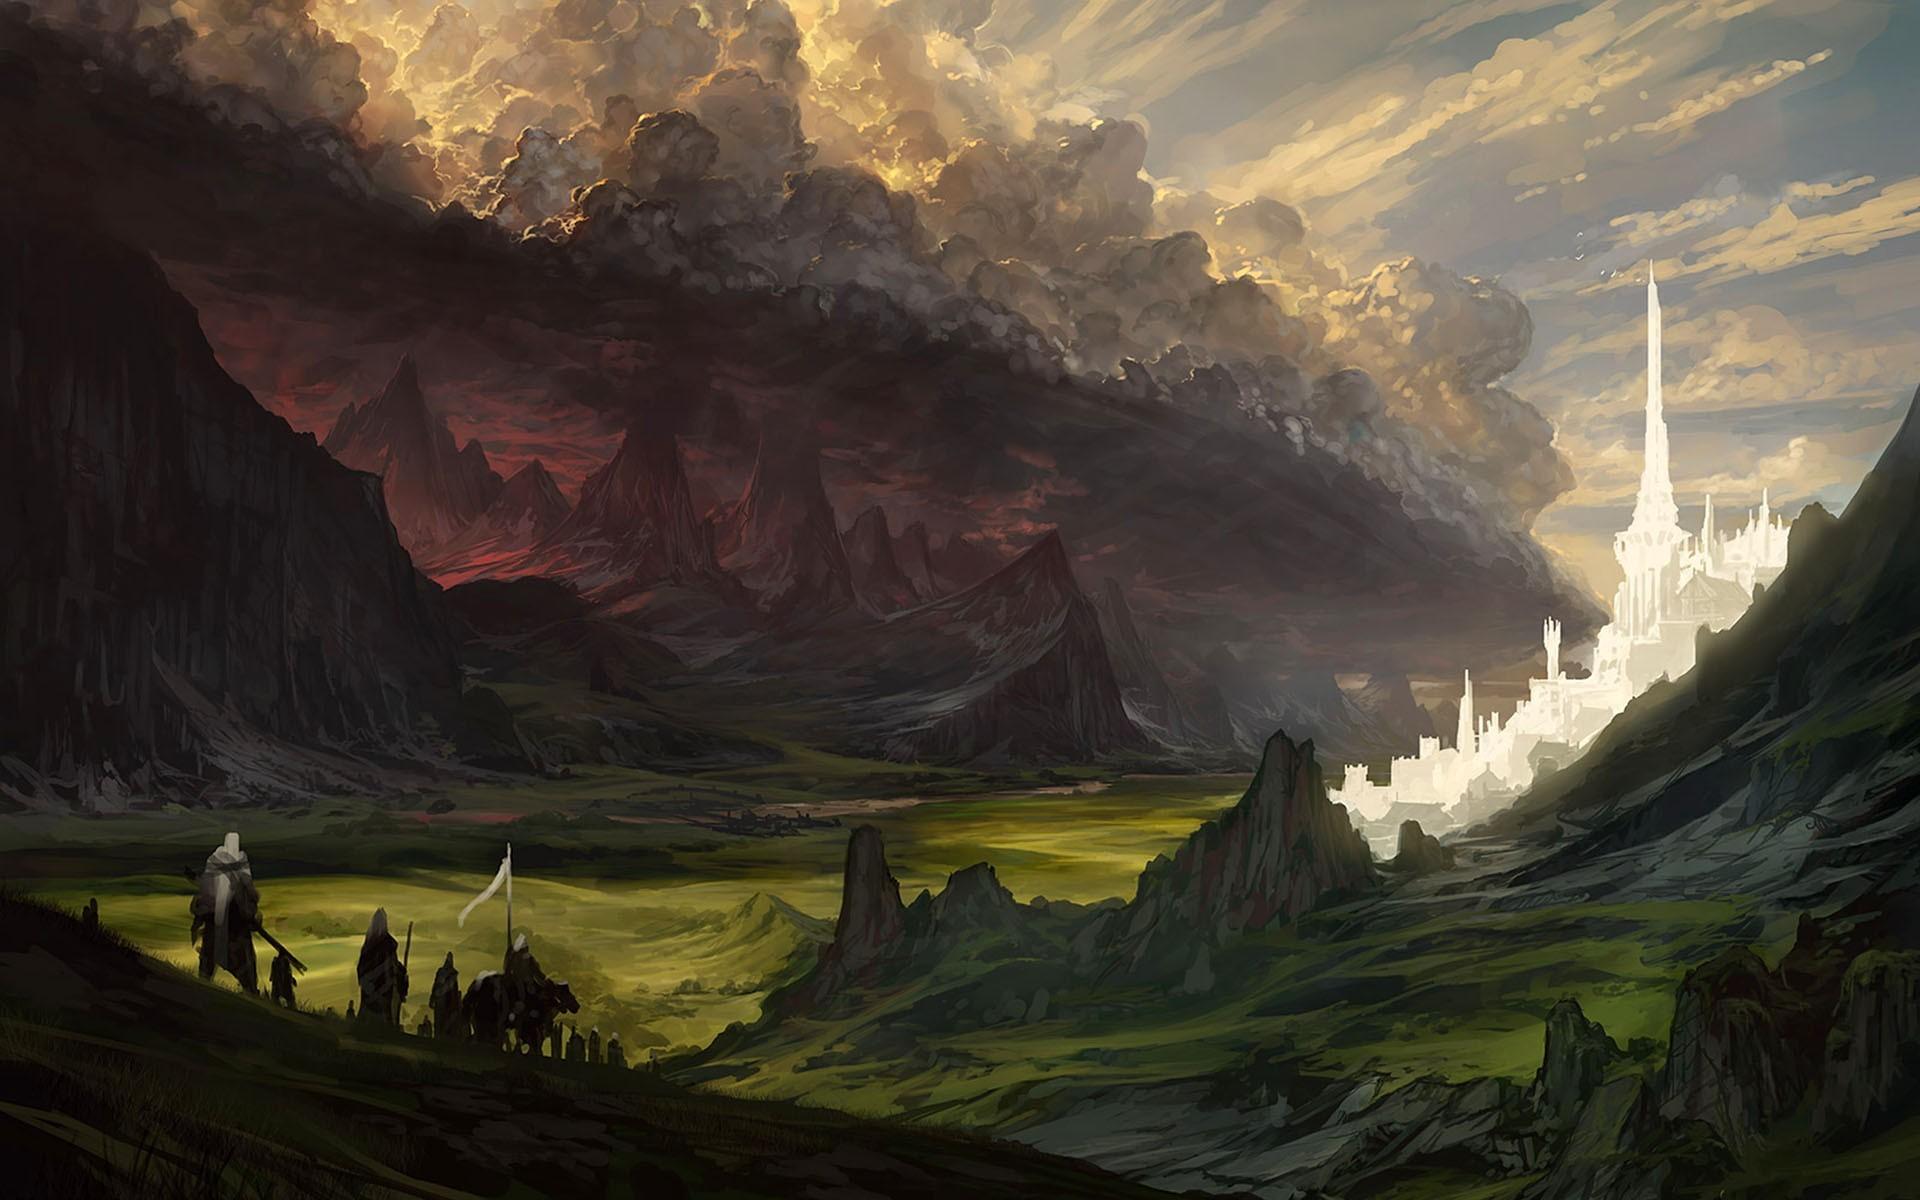 Wallpaper Sunlight Fantasy Art Morning The Lord Of The Rings